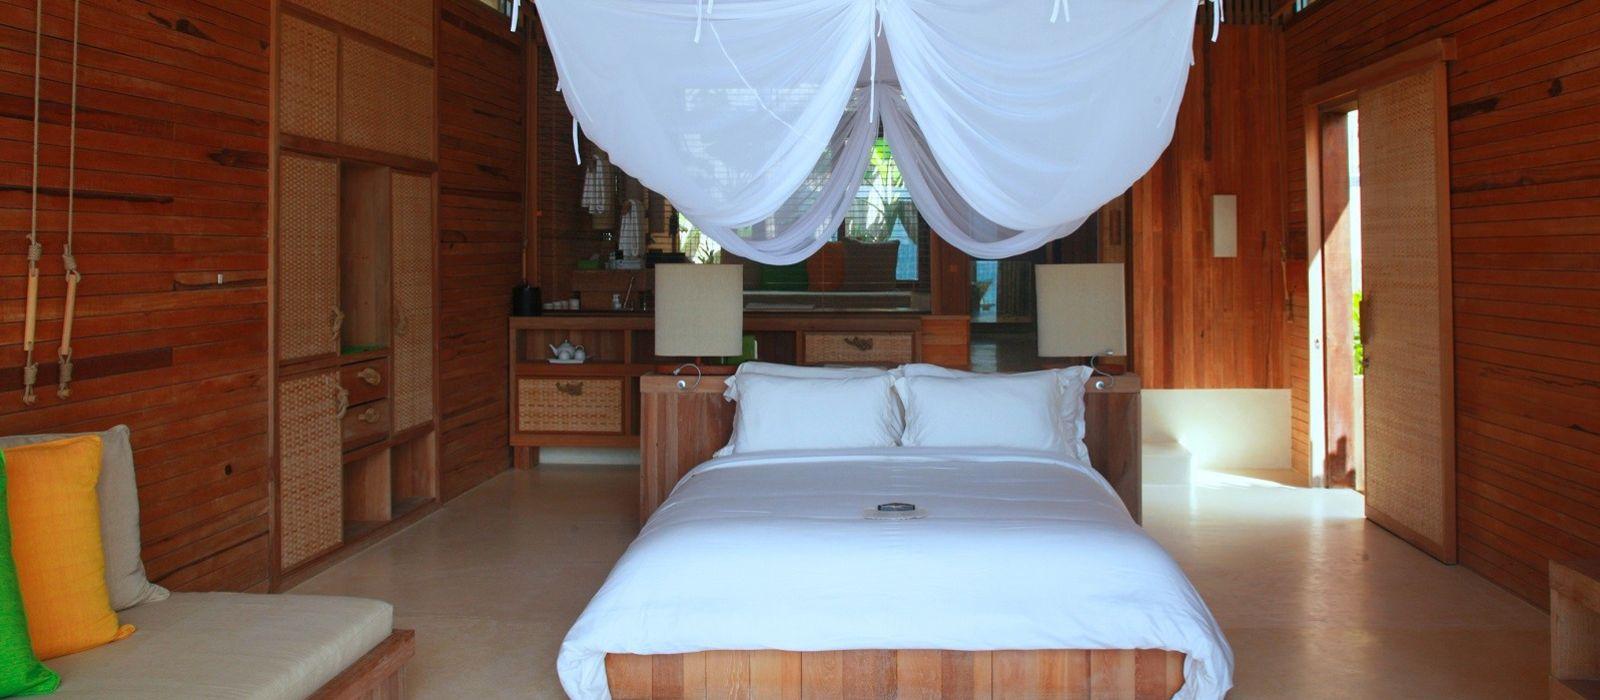 Hotel Six Senses (Con Dao) Vietnam